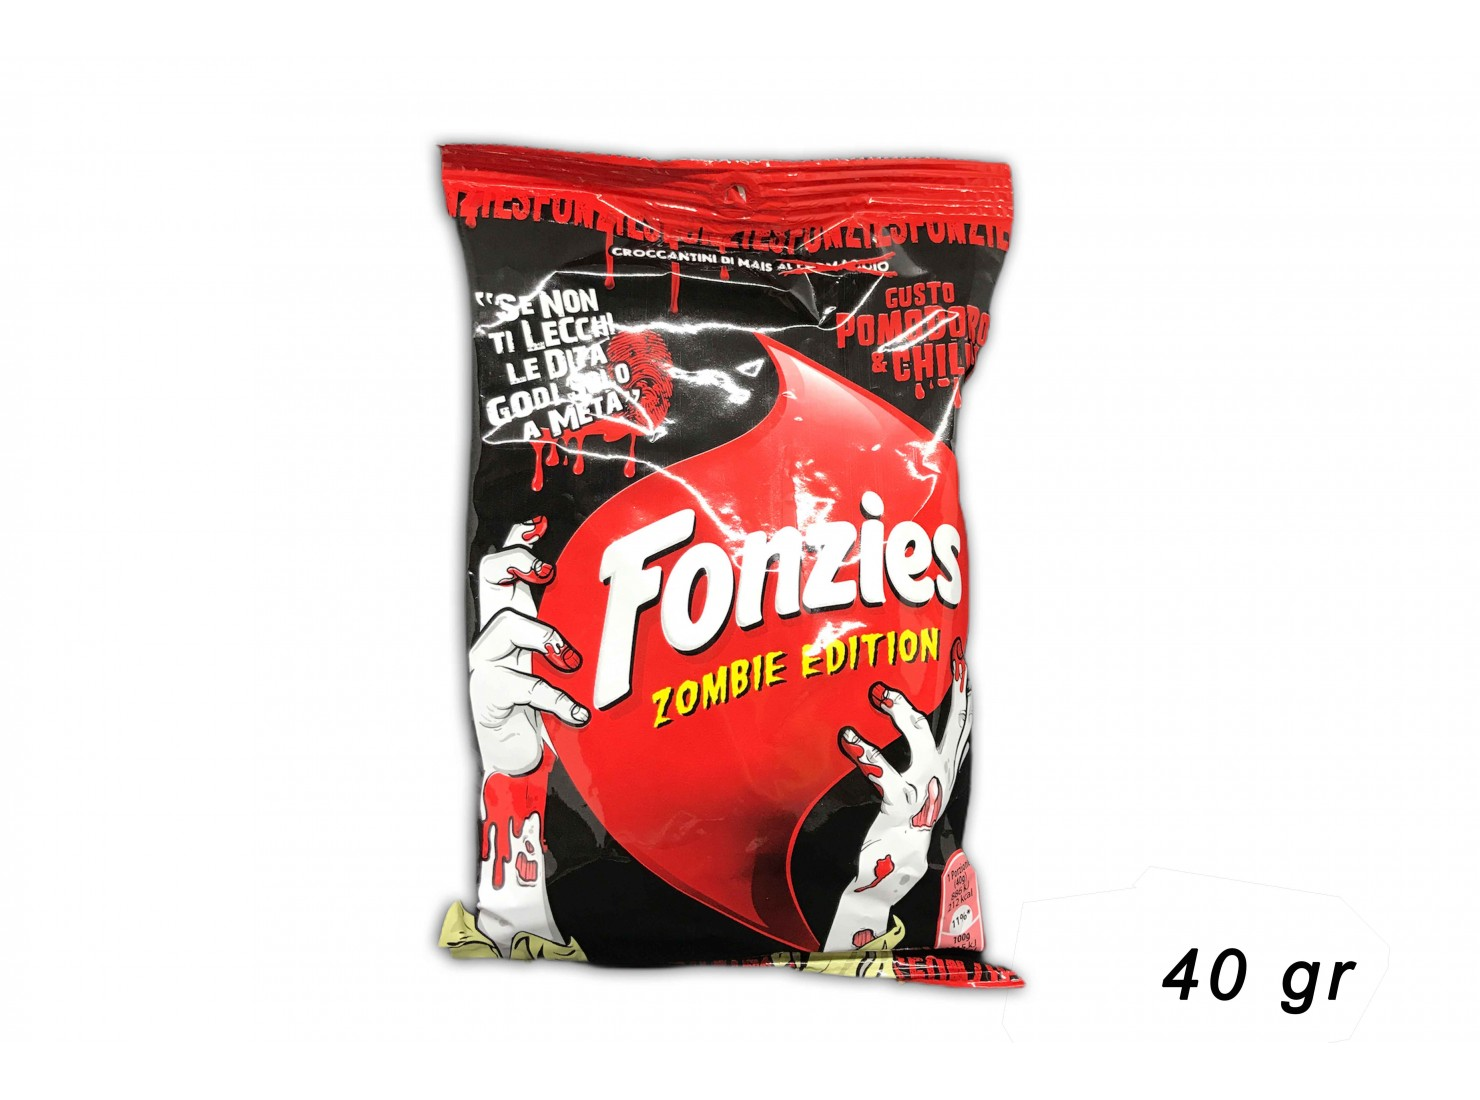 FONZIES ZOMBIE EDITION 40 GR